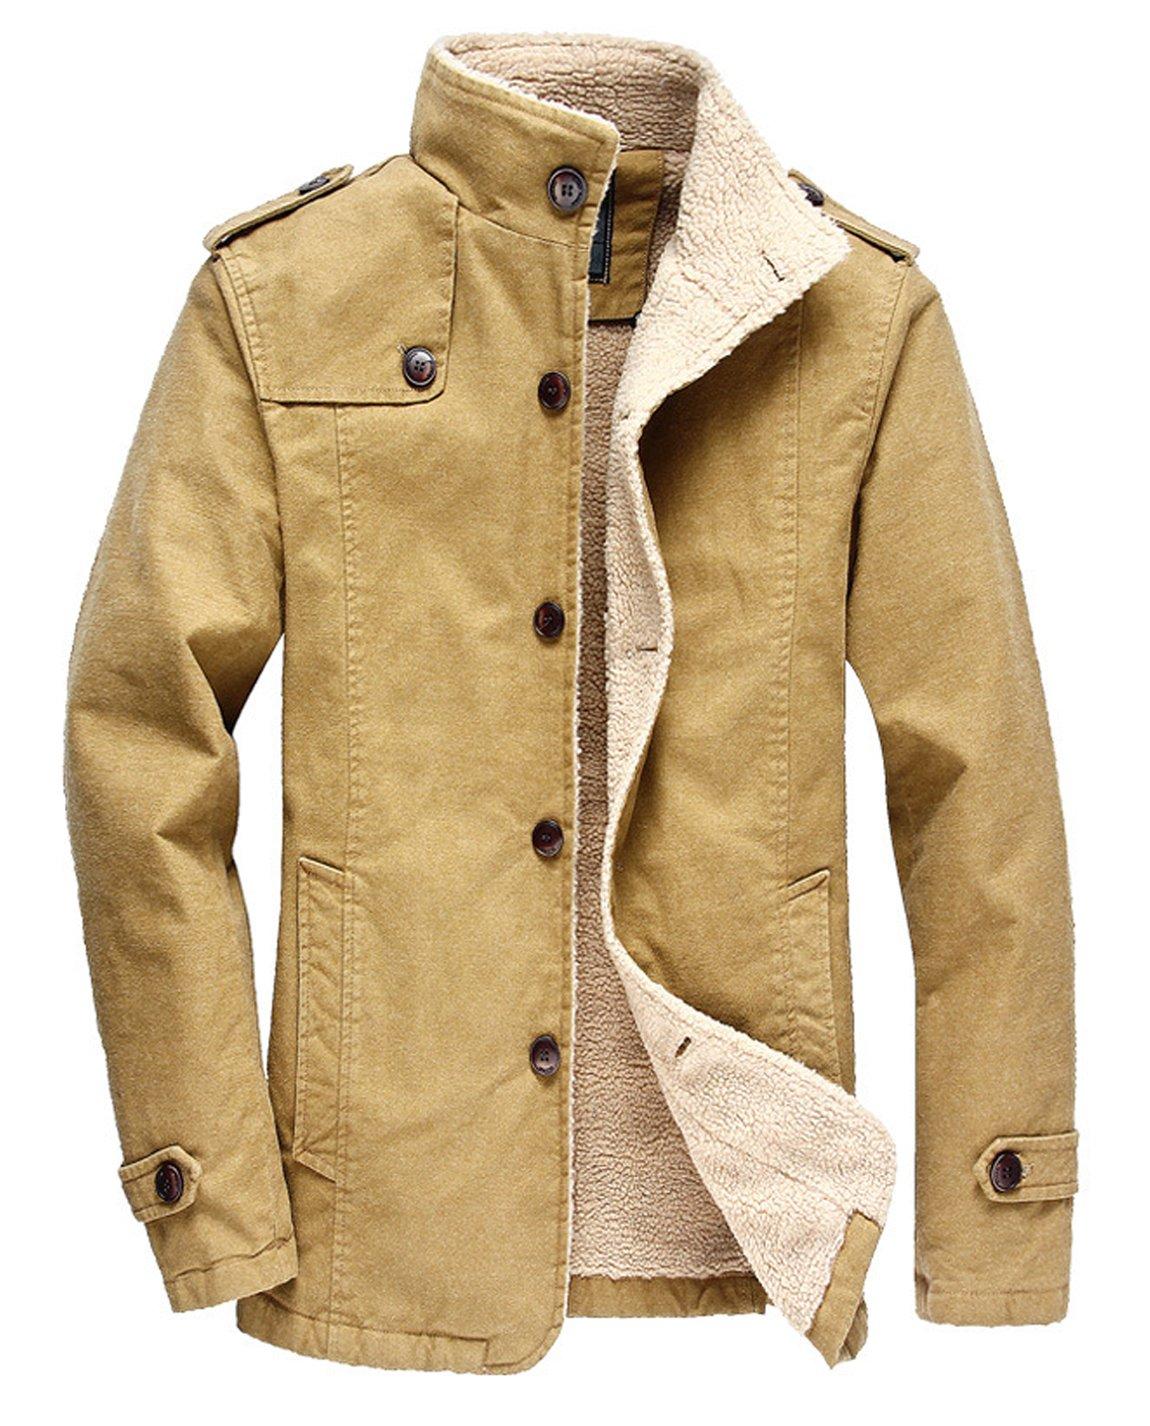 HOWON Men's Winter Fleece Casual Cotton Jacket Military Cargo Jacket Outwear Parka Winter Coat Khaki XL